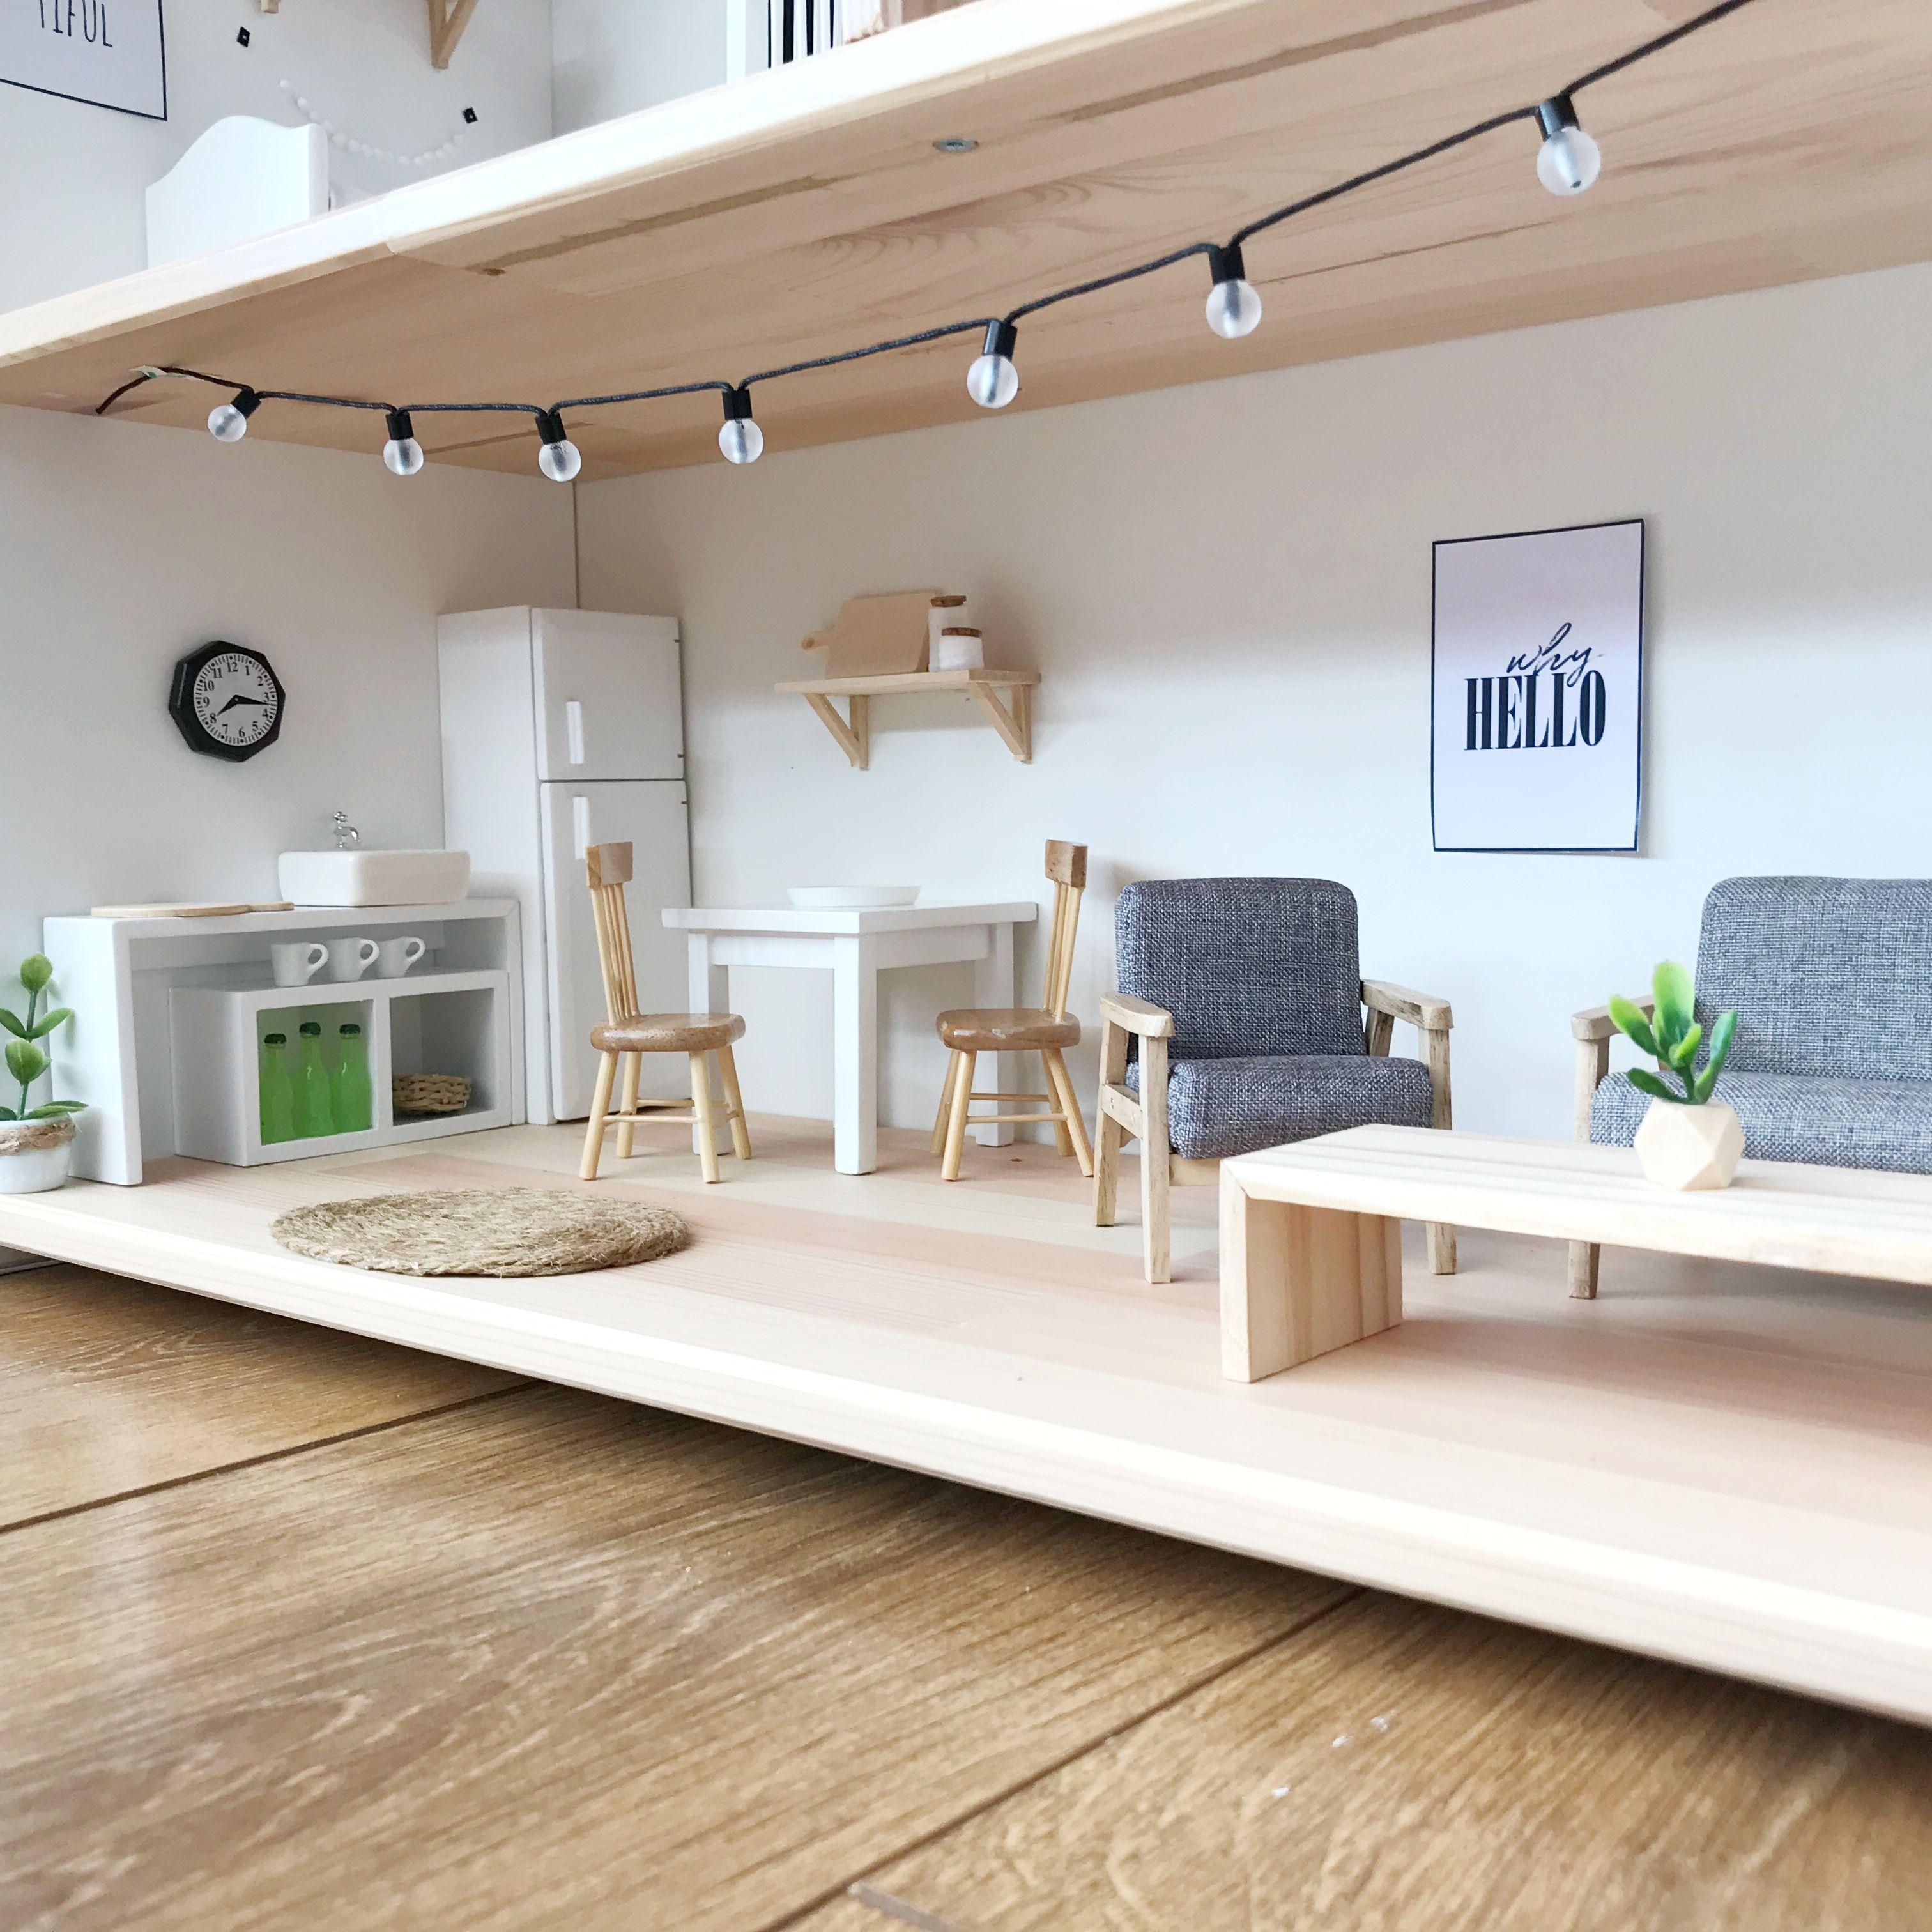 Modern Dollhouse Furniture And Decor